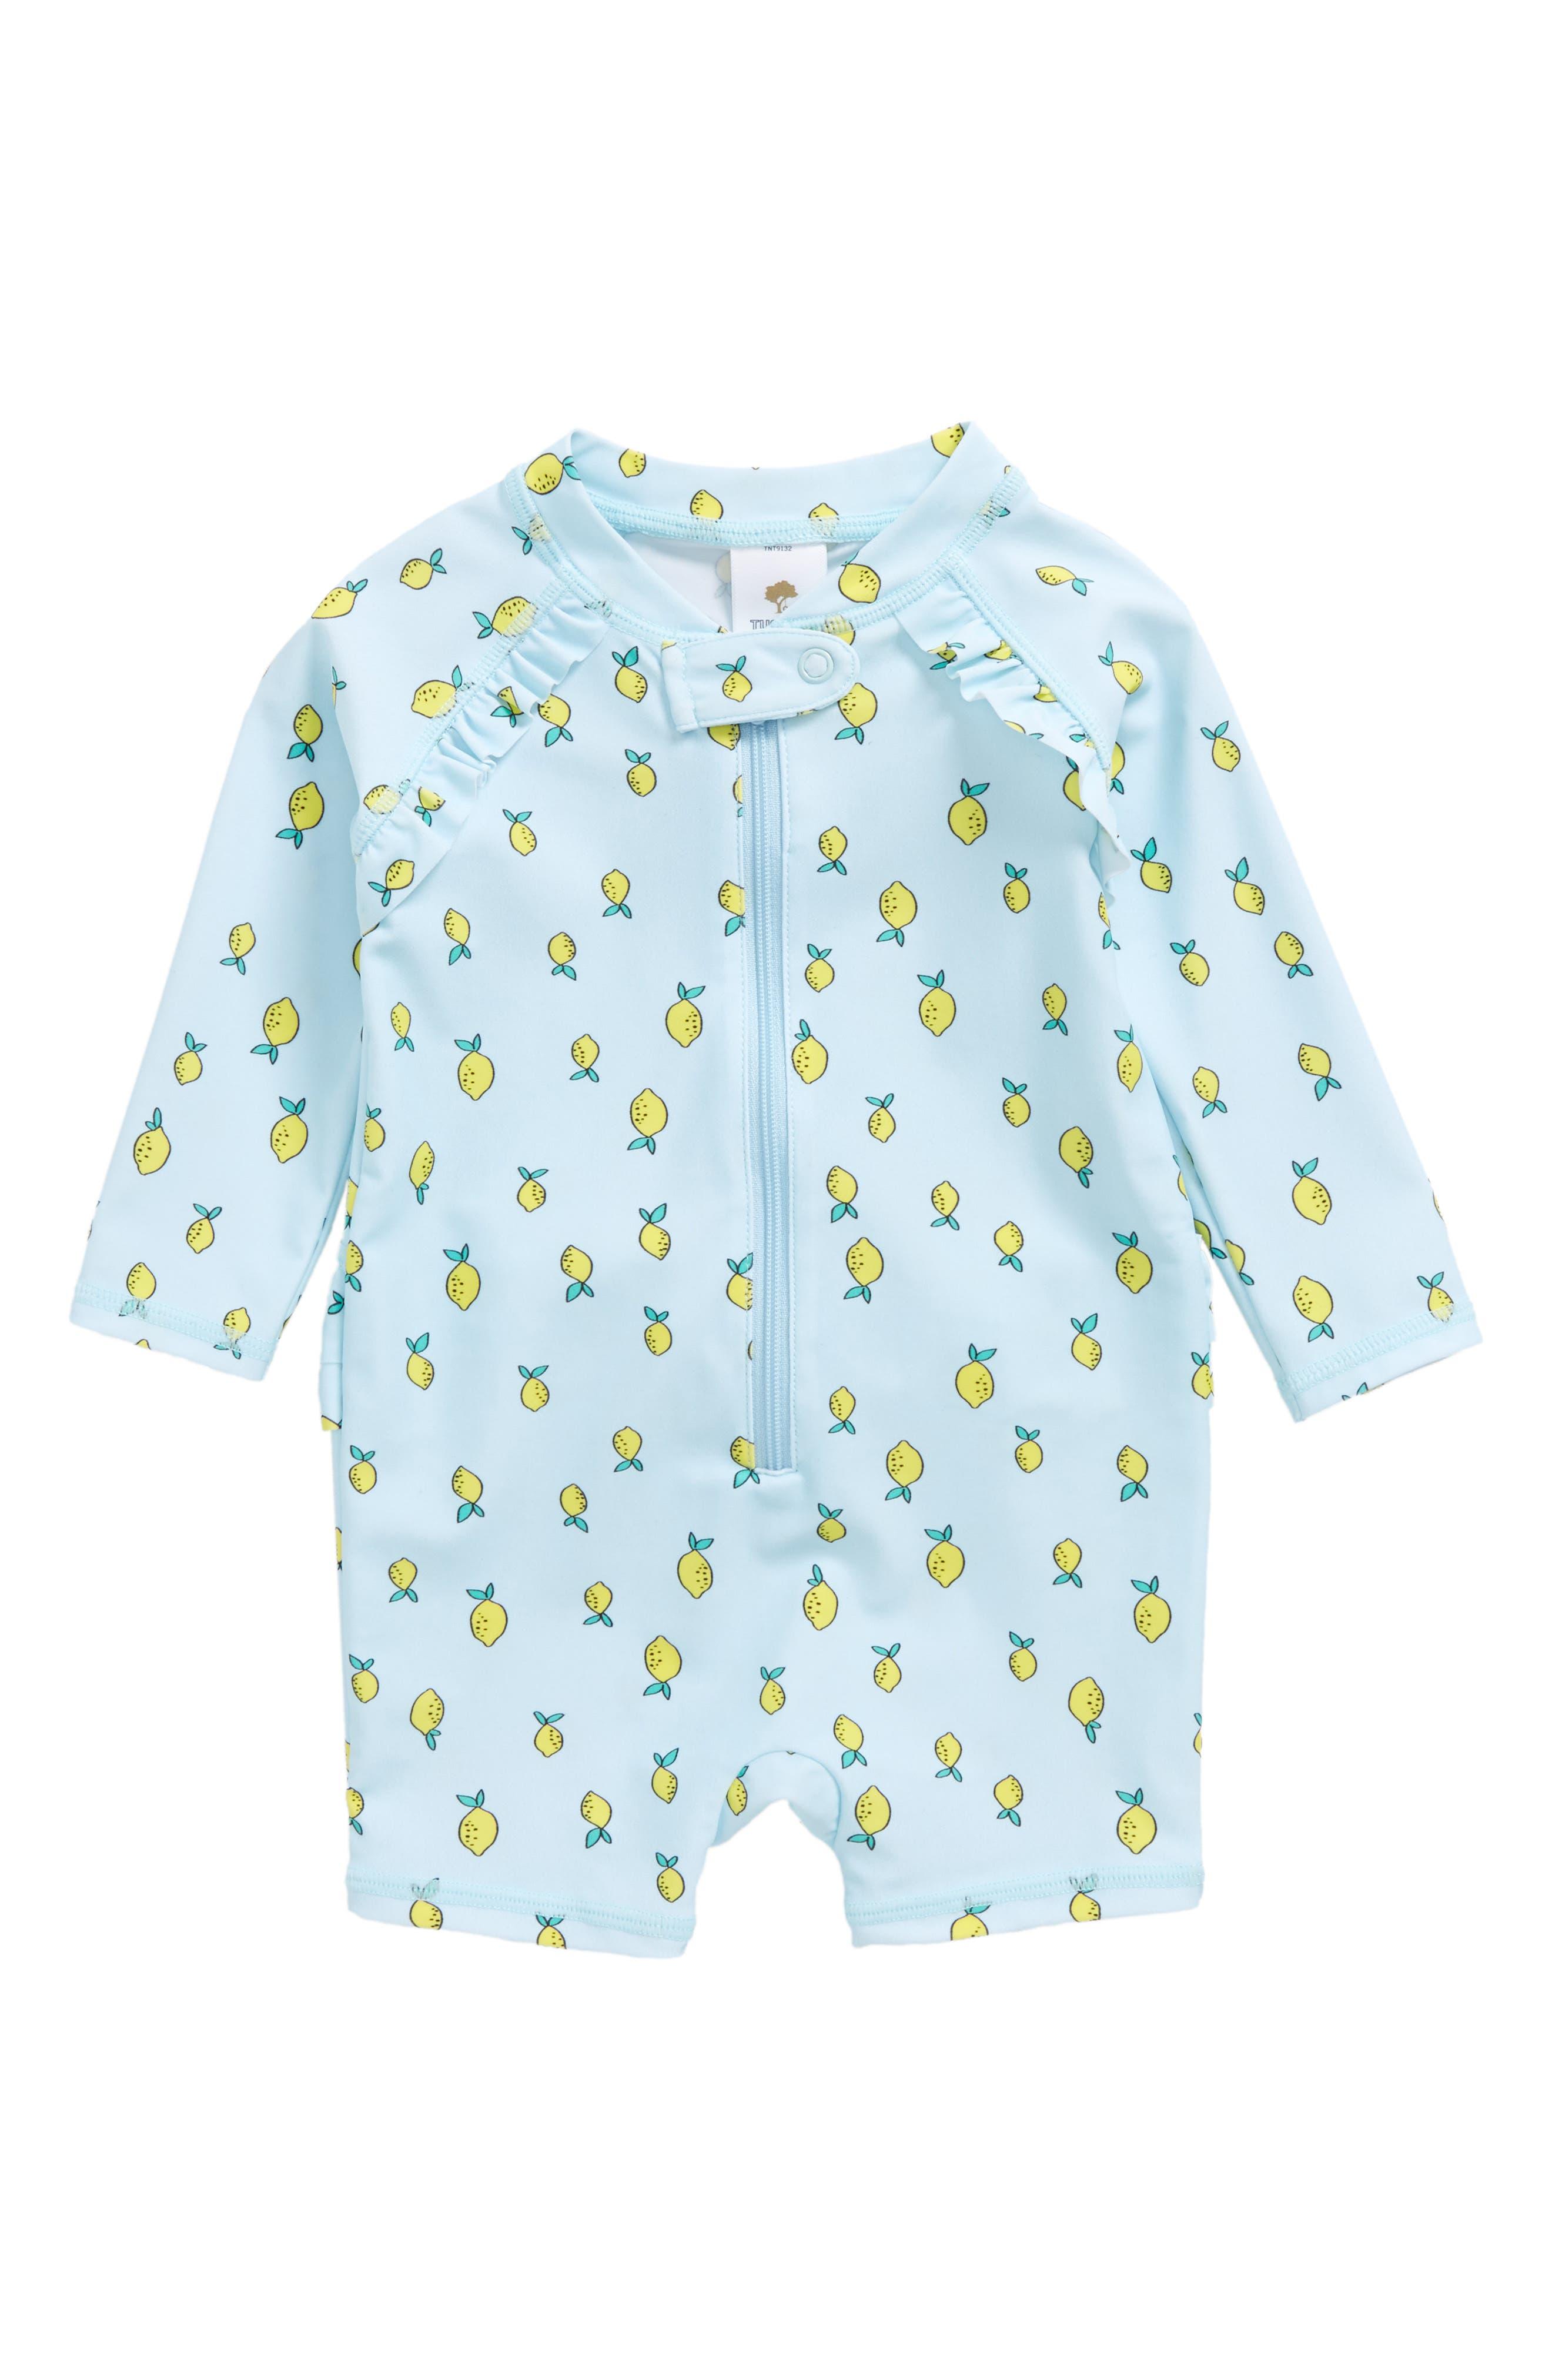 Lemon Print One-Piece Rashguard Swimsuit,                         Main,                         color, Blue Glow Lemons